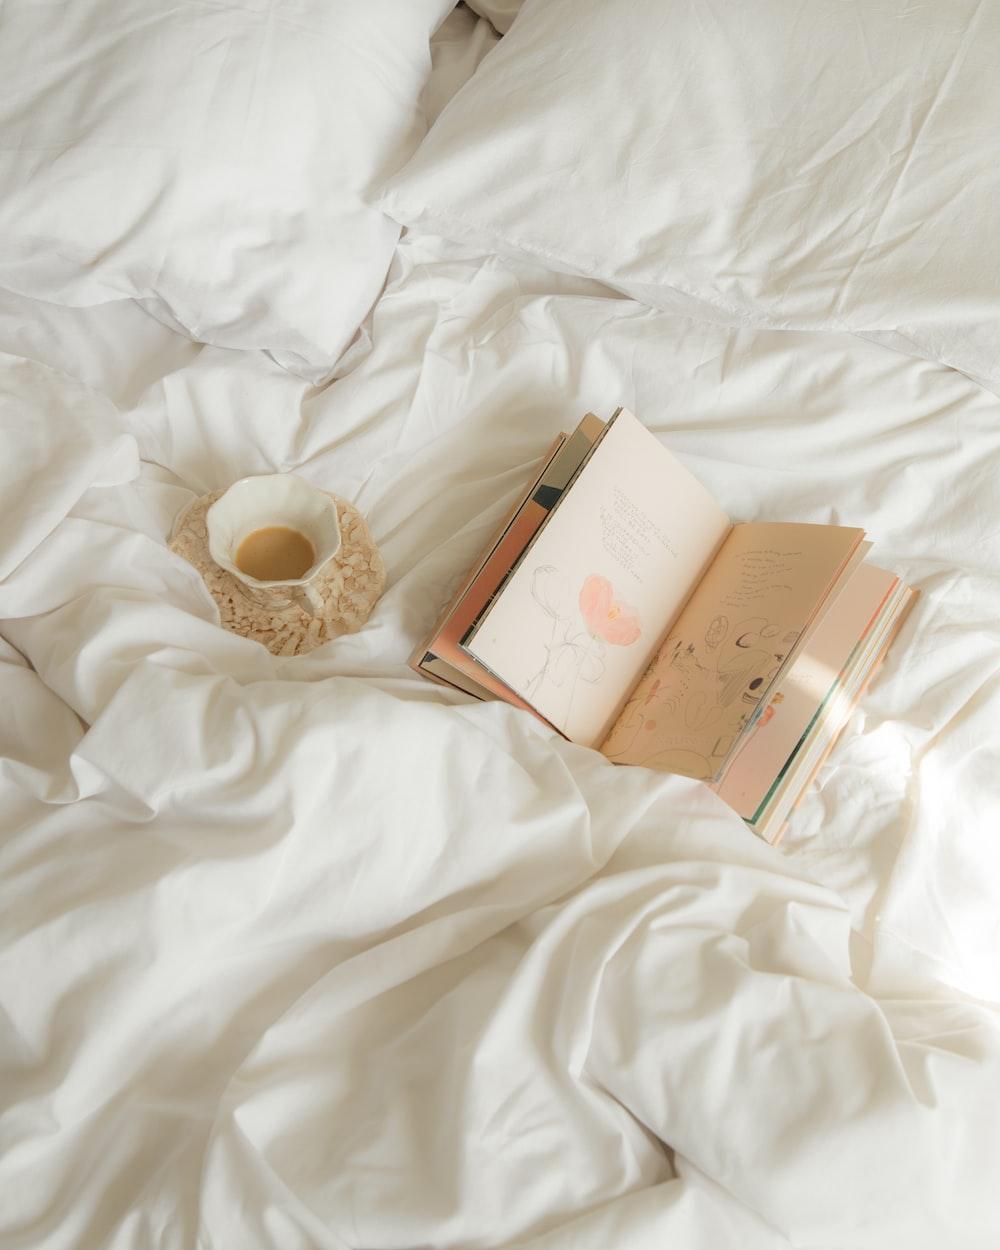 white and gold box on white textile